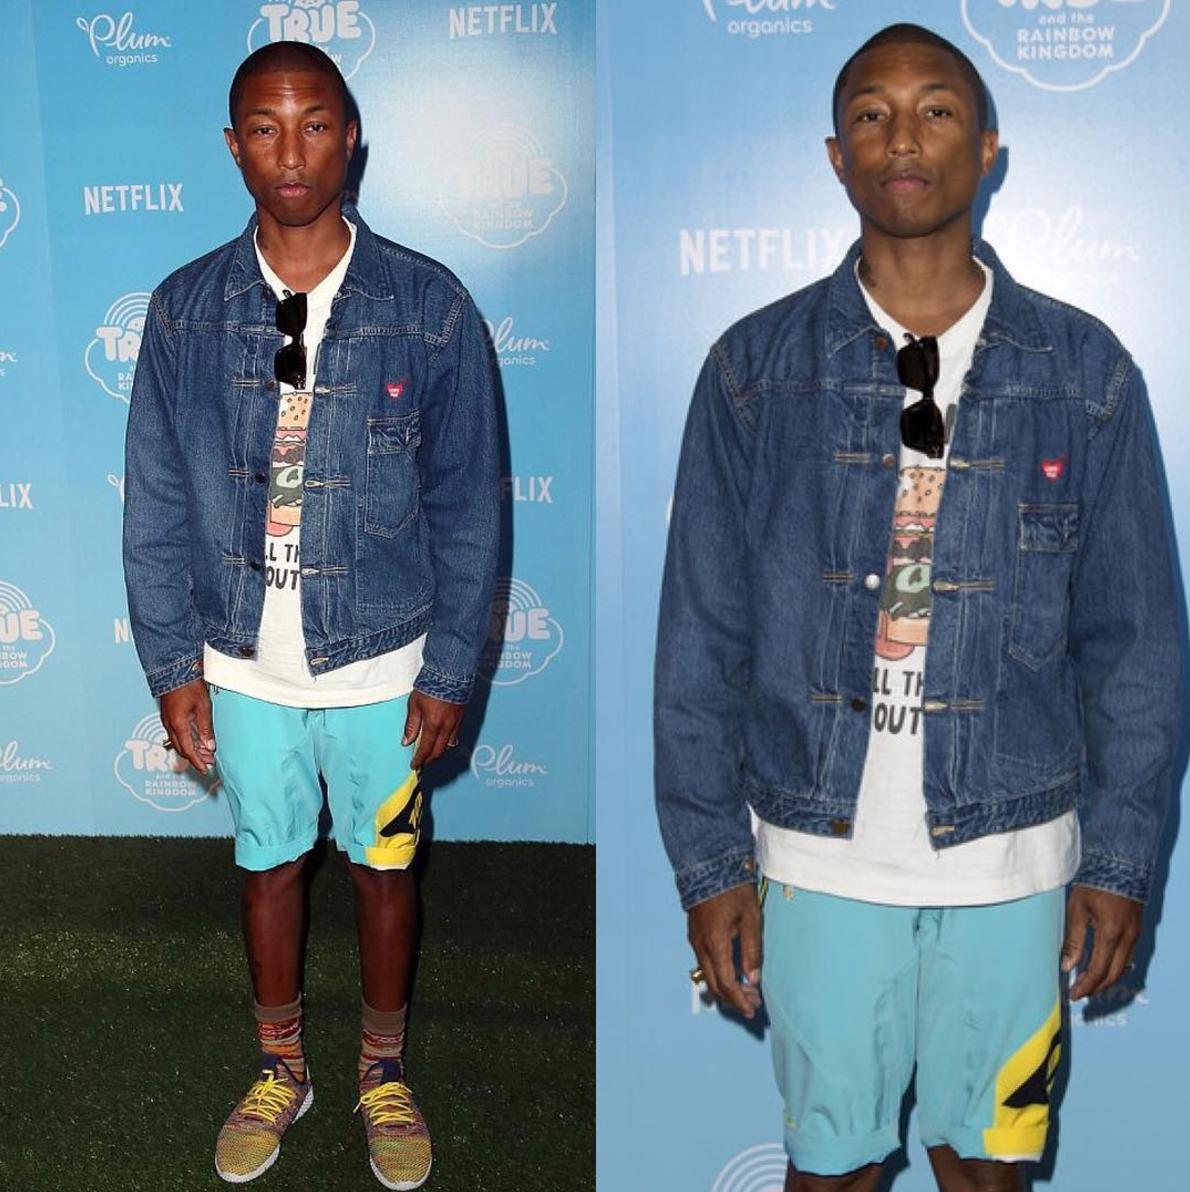 SPOTTED: Pharrell Williams In Human Made Denim Jacket And Pharrell Williams x Adidas Originals Tennis Hu Sneakers